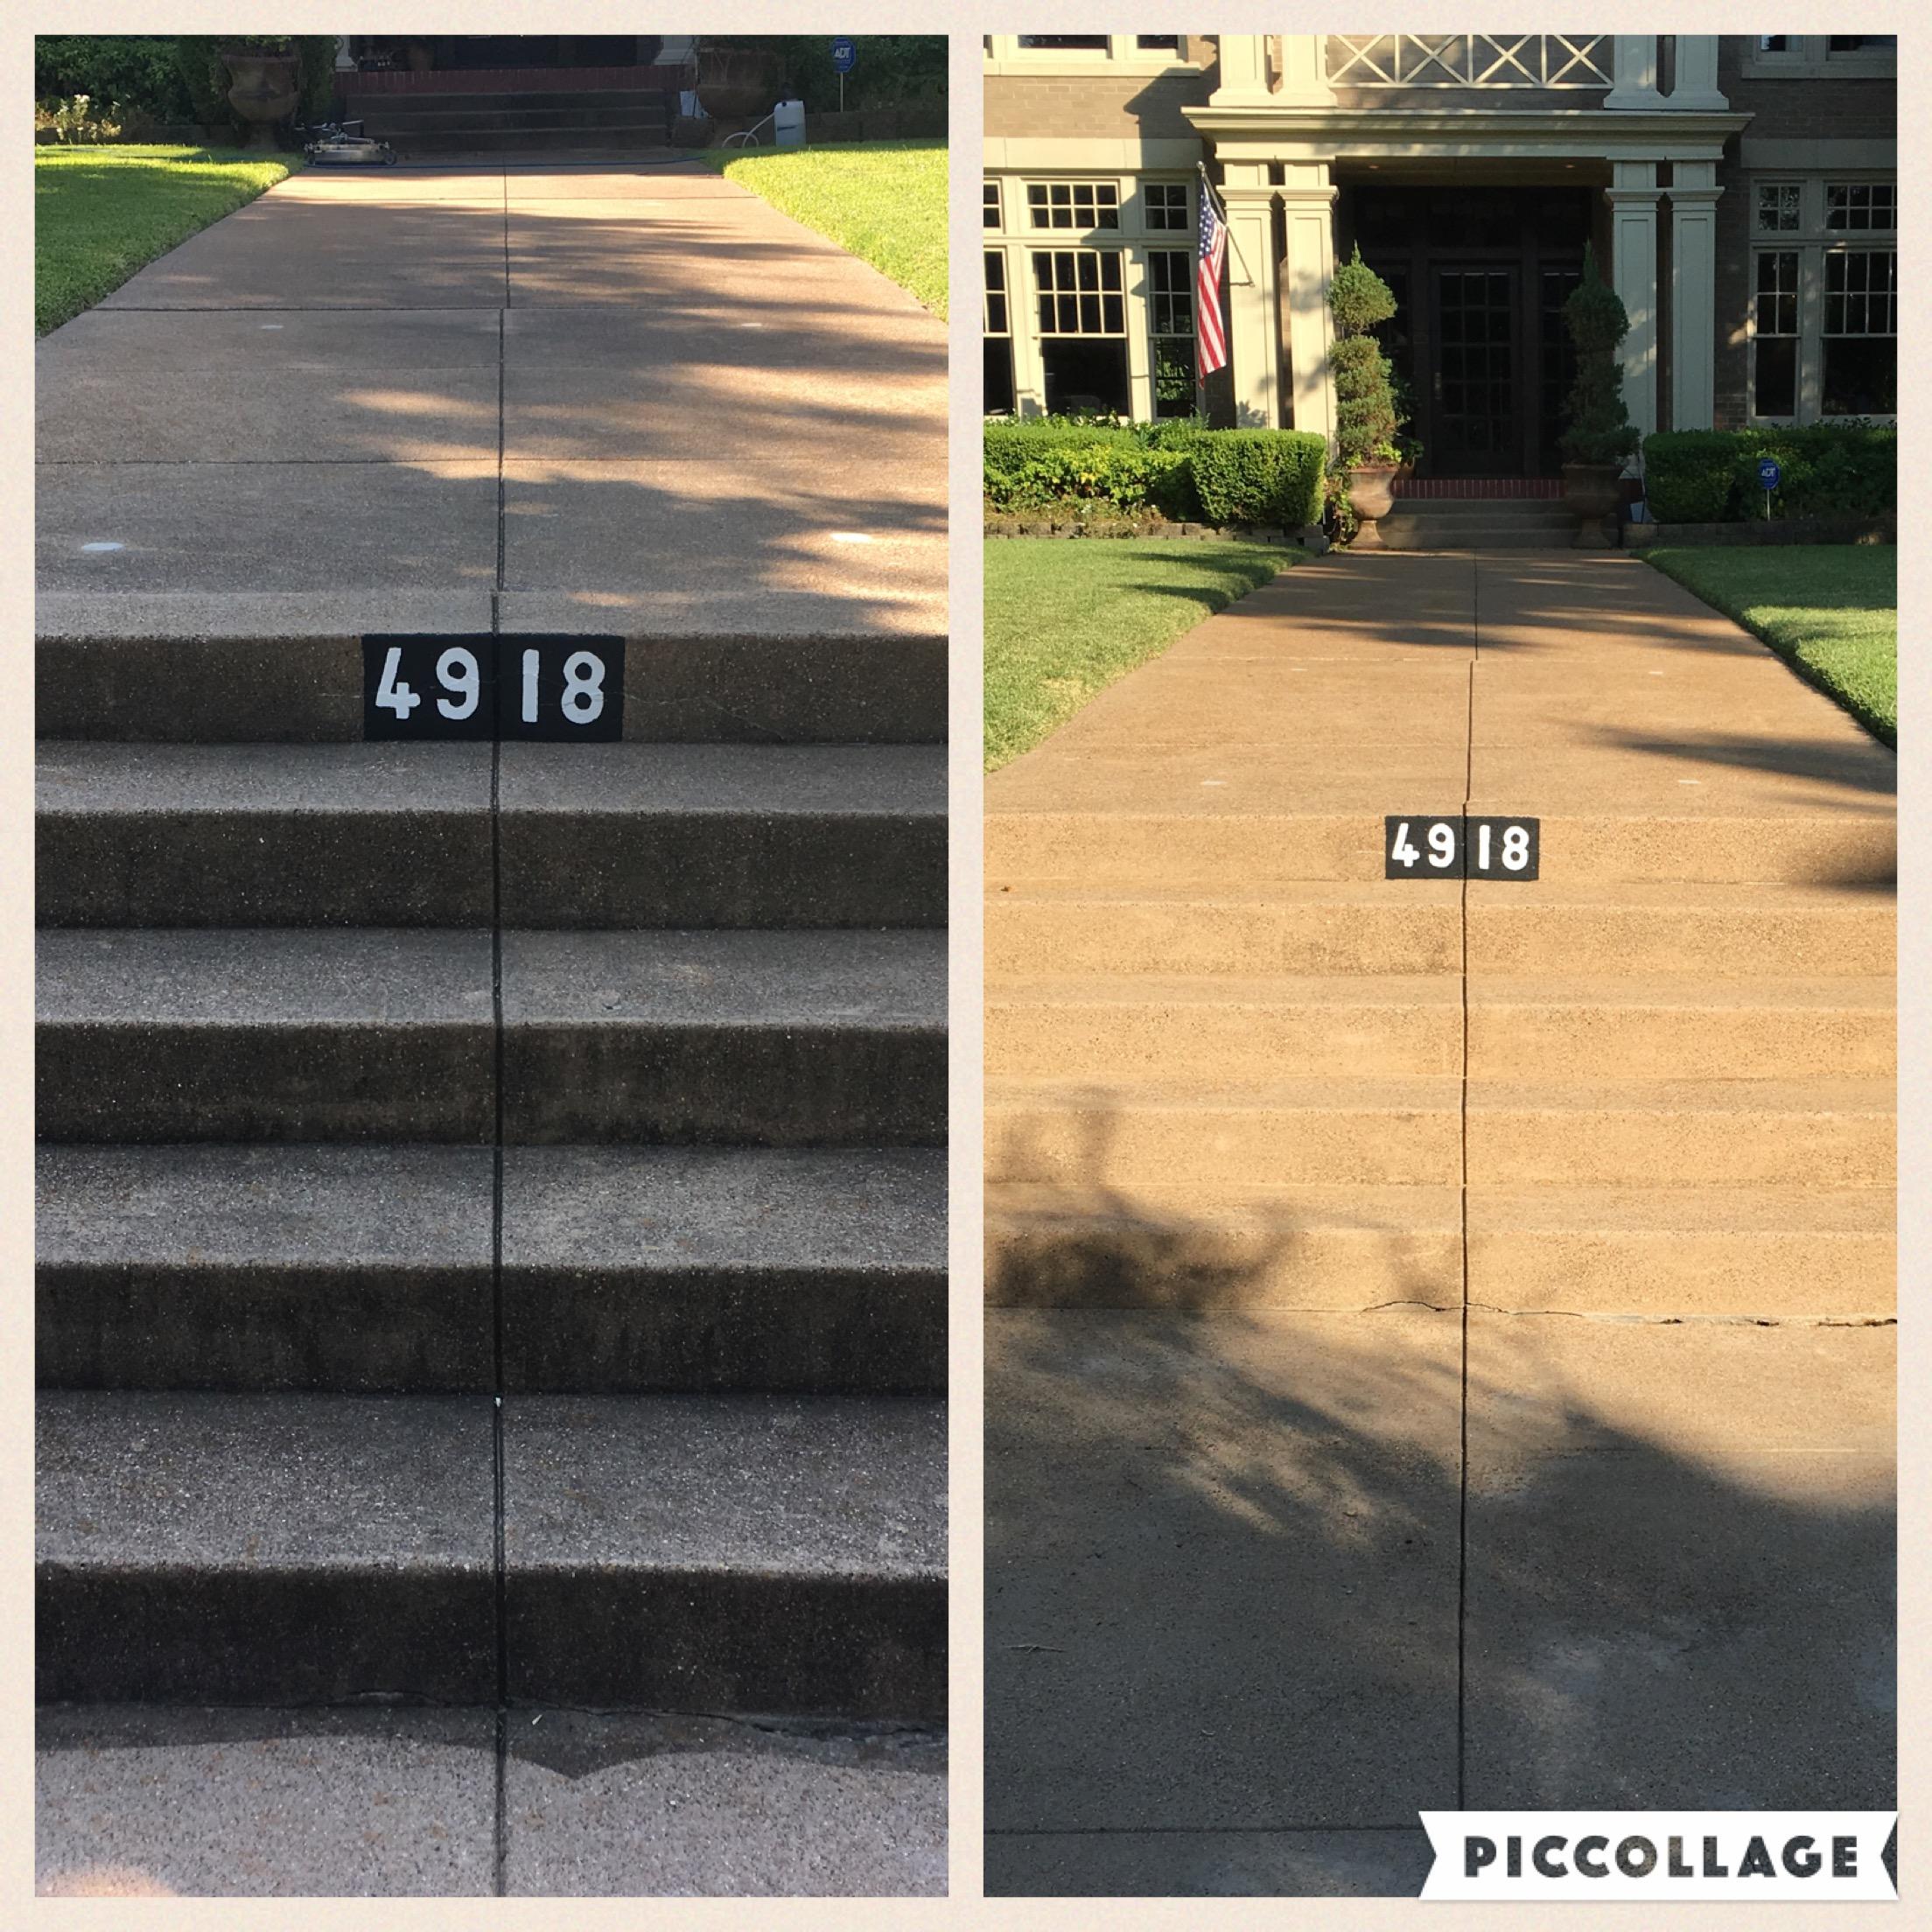 Pressure washing sidewalks